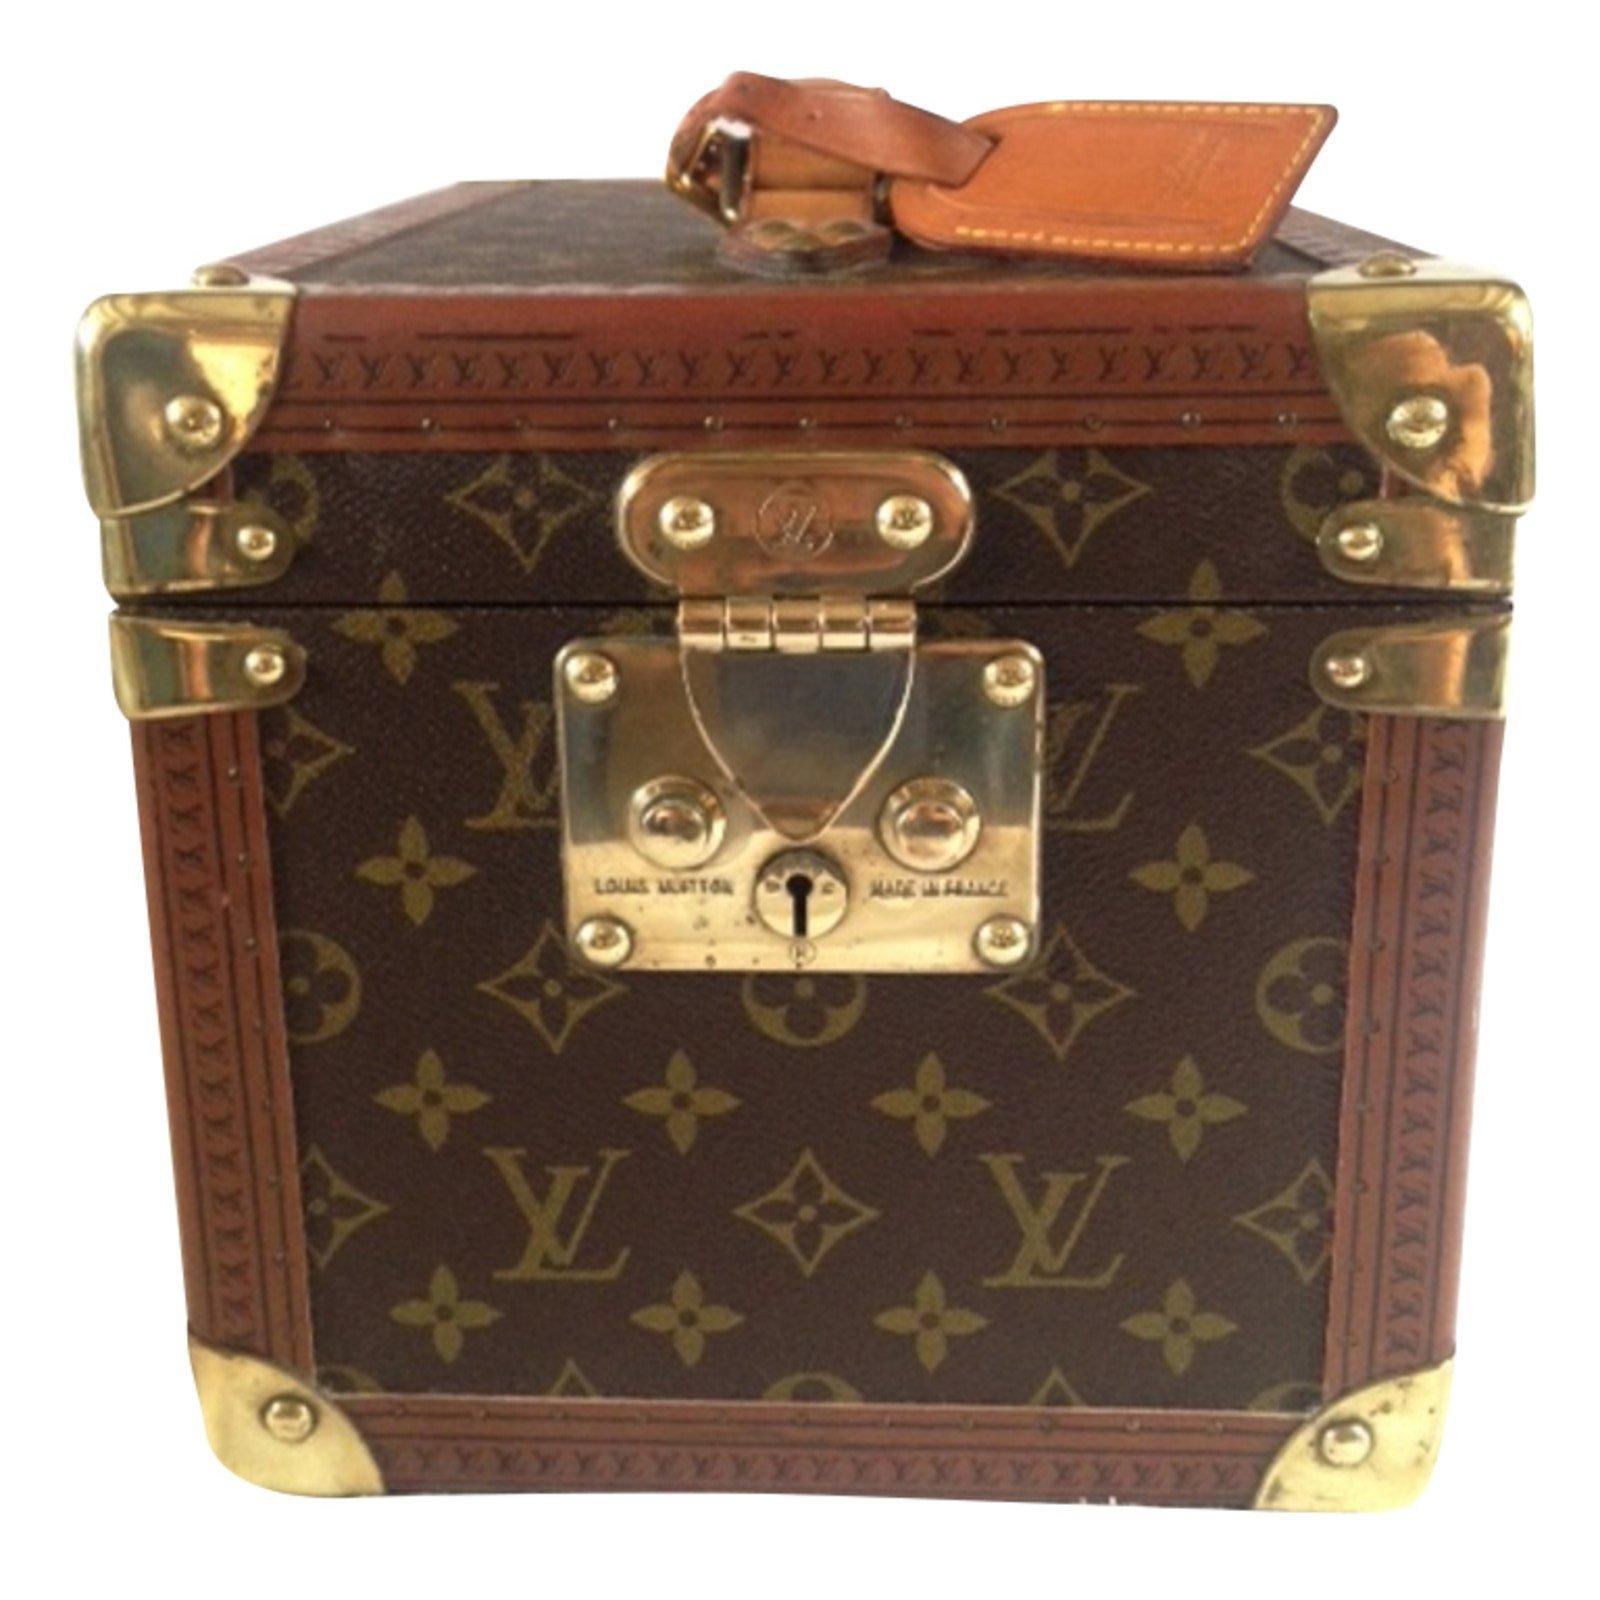 sacs de voyage louis vuitton vanity case cuir toile marron joli closet. Black Bedroom Furniture Sets. Home Design Ideas